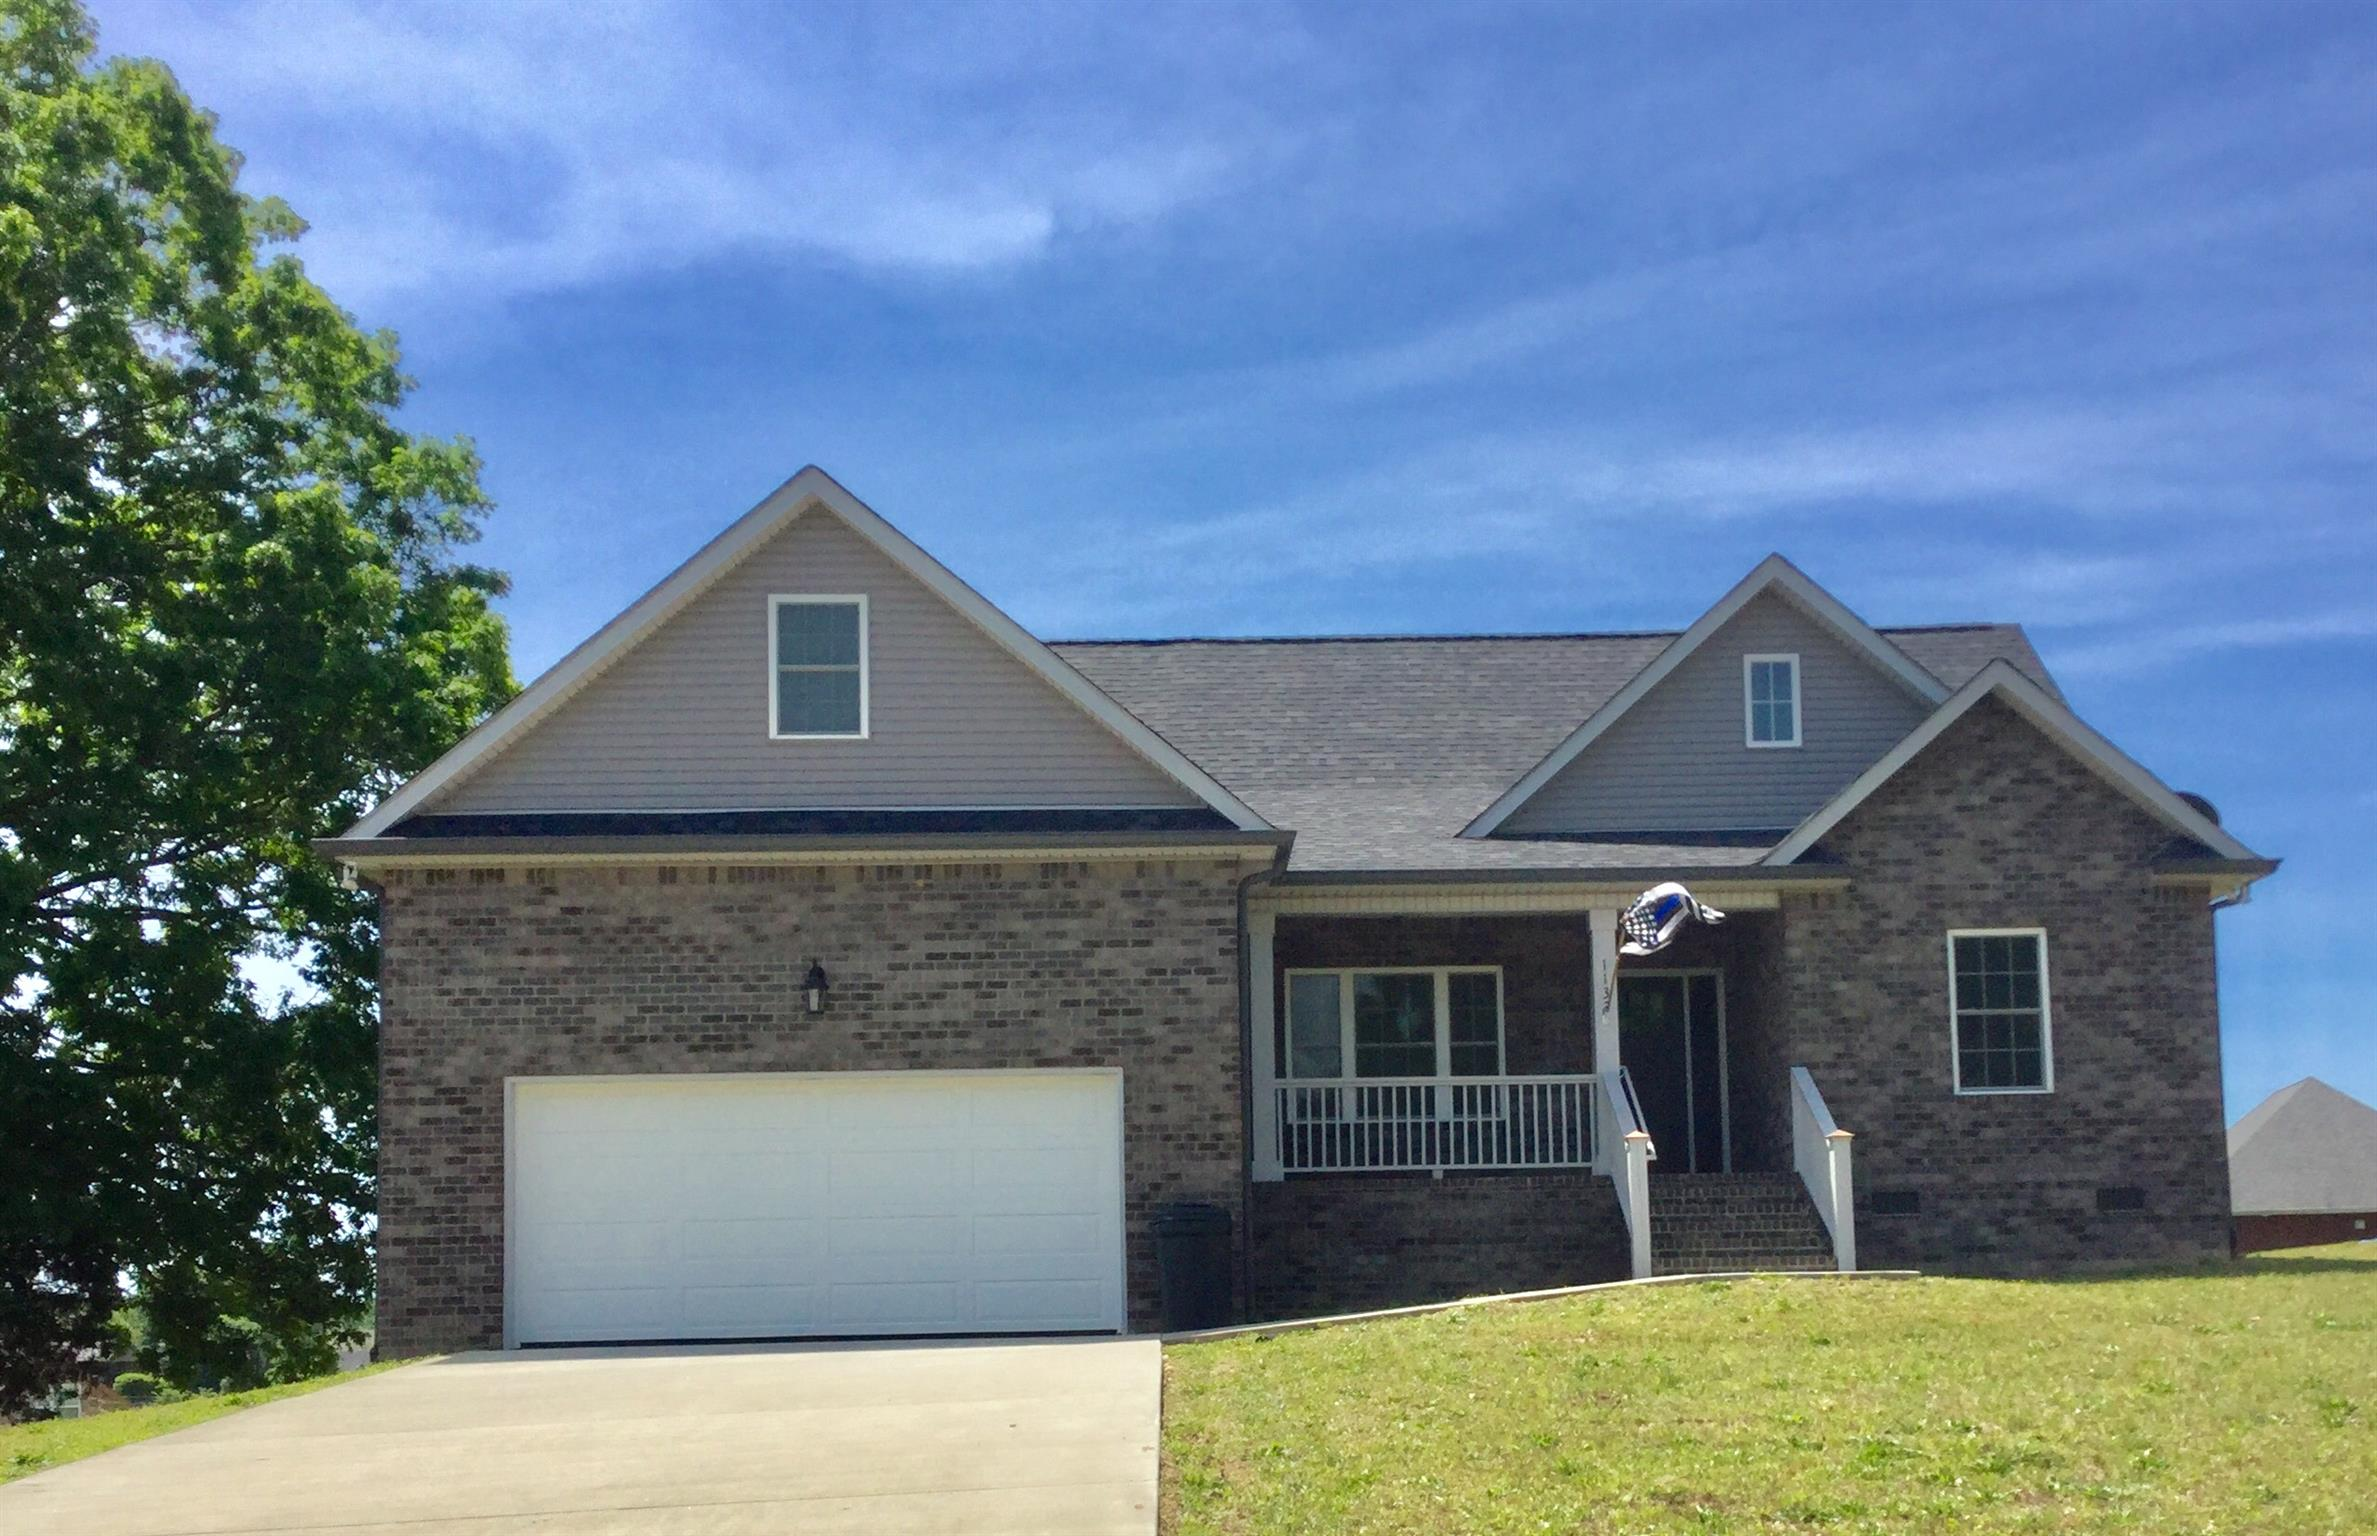 1132 High Lake Dr, Dickson, TN 37055 - Dickson, TN real estate listing